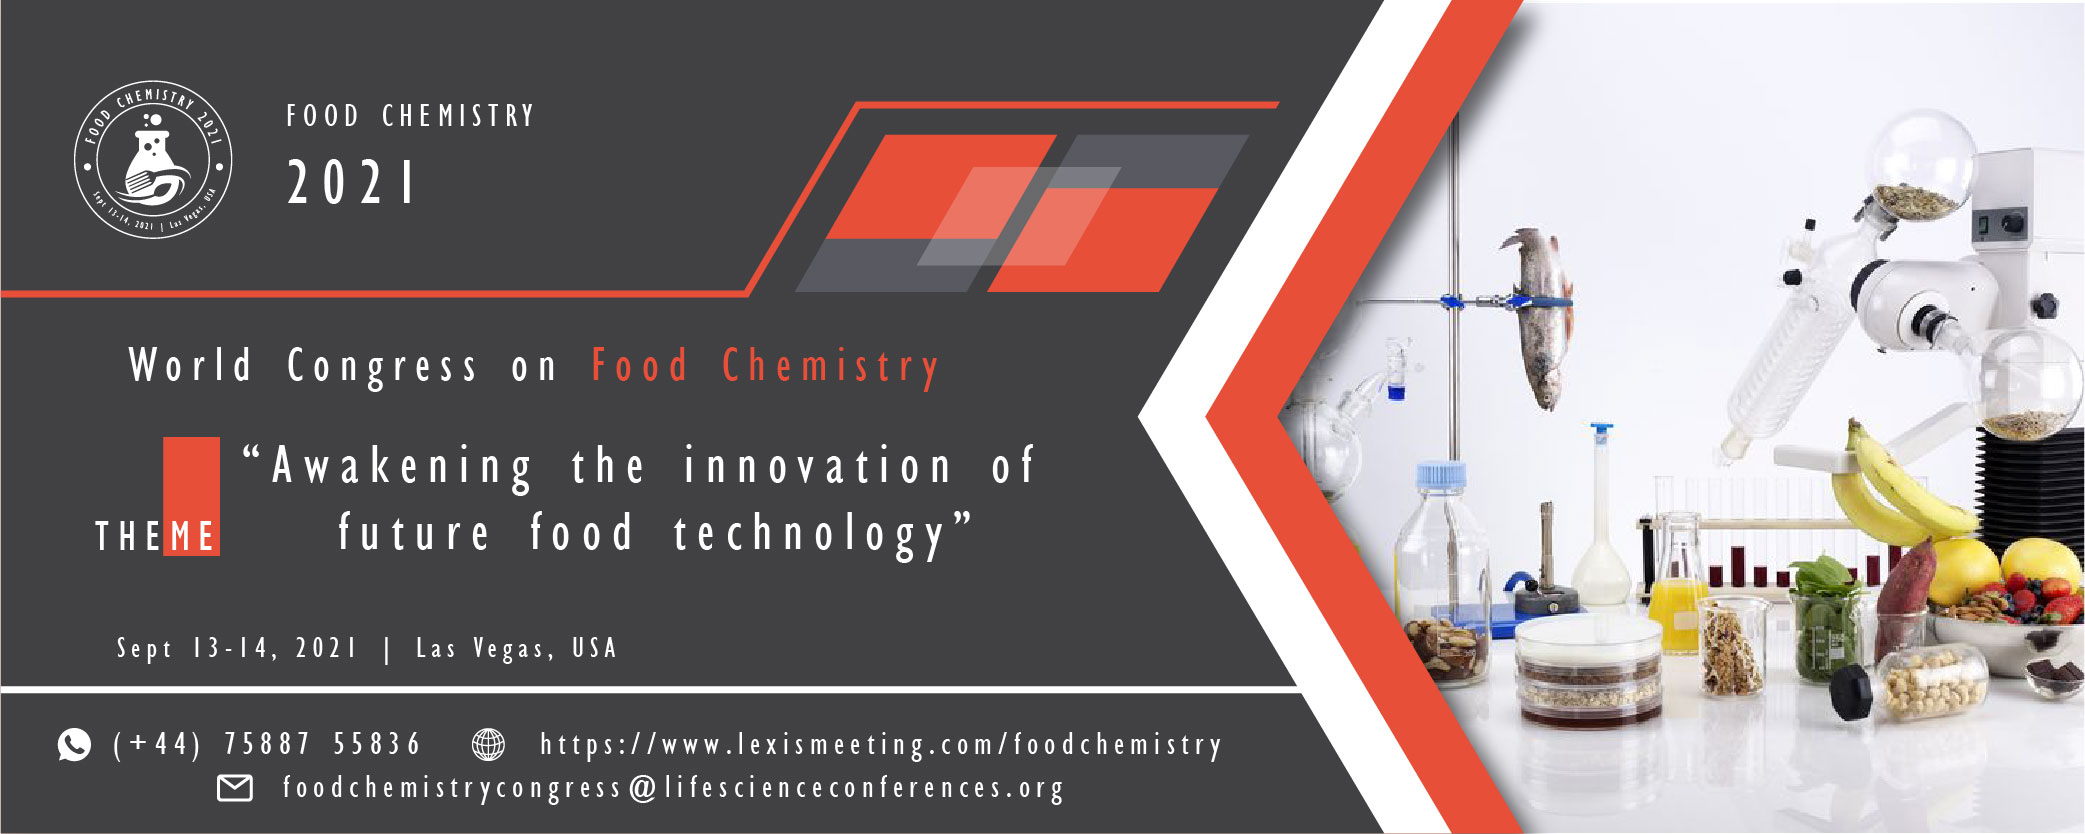 Food Chemistry Congress